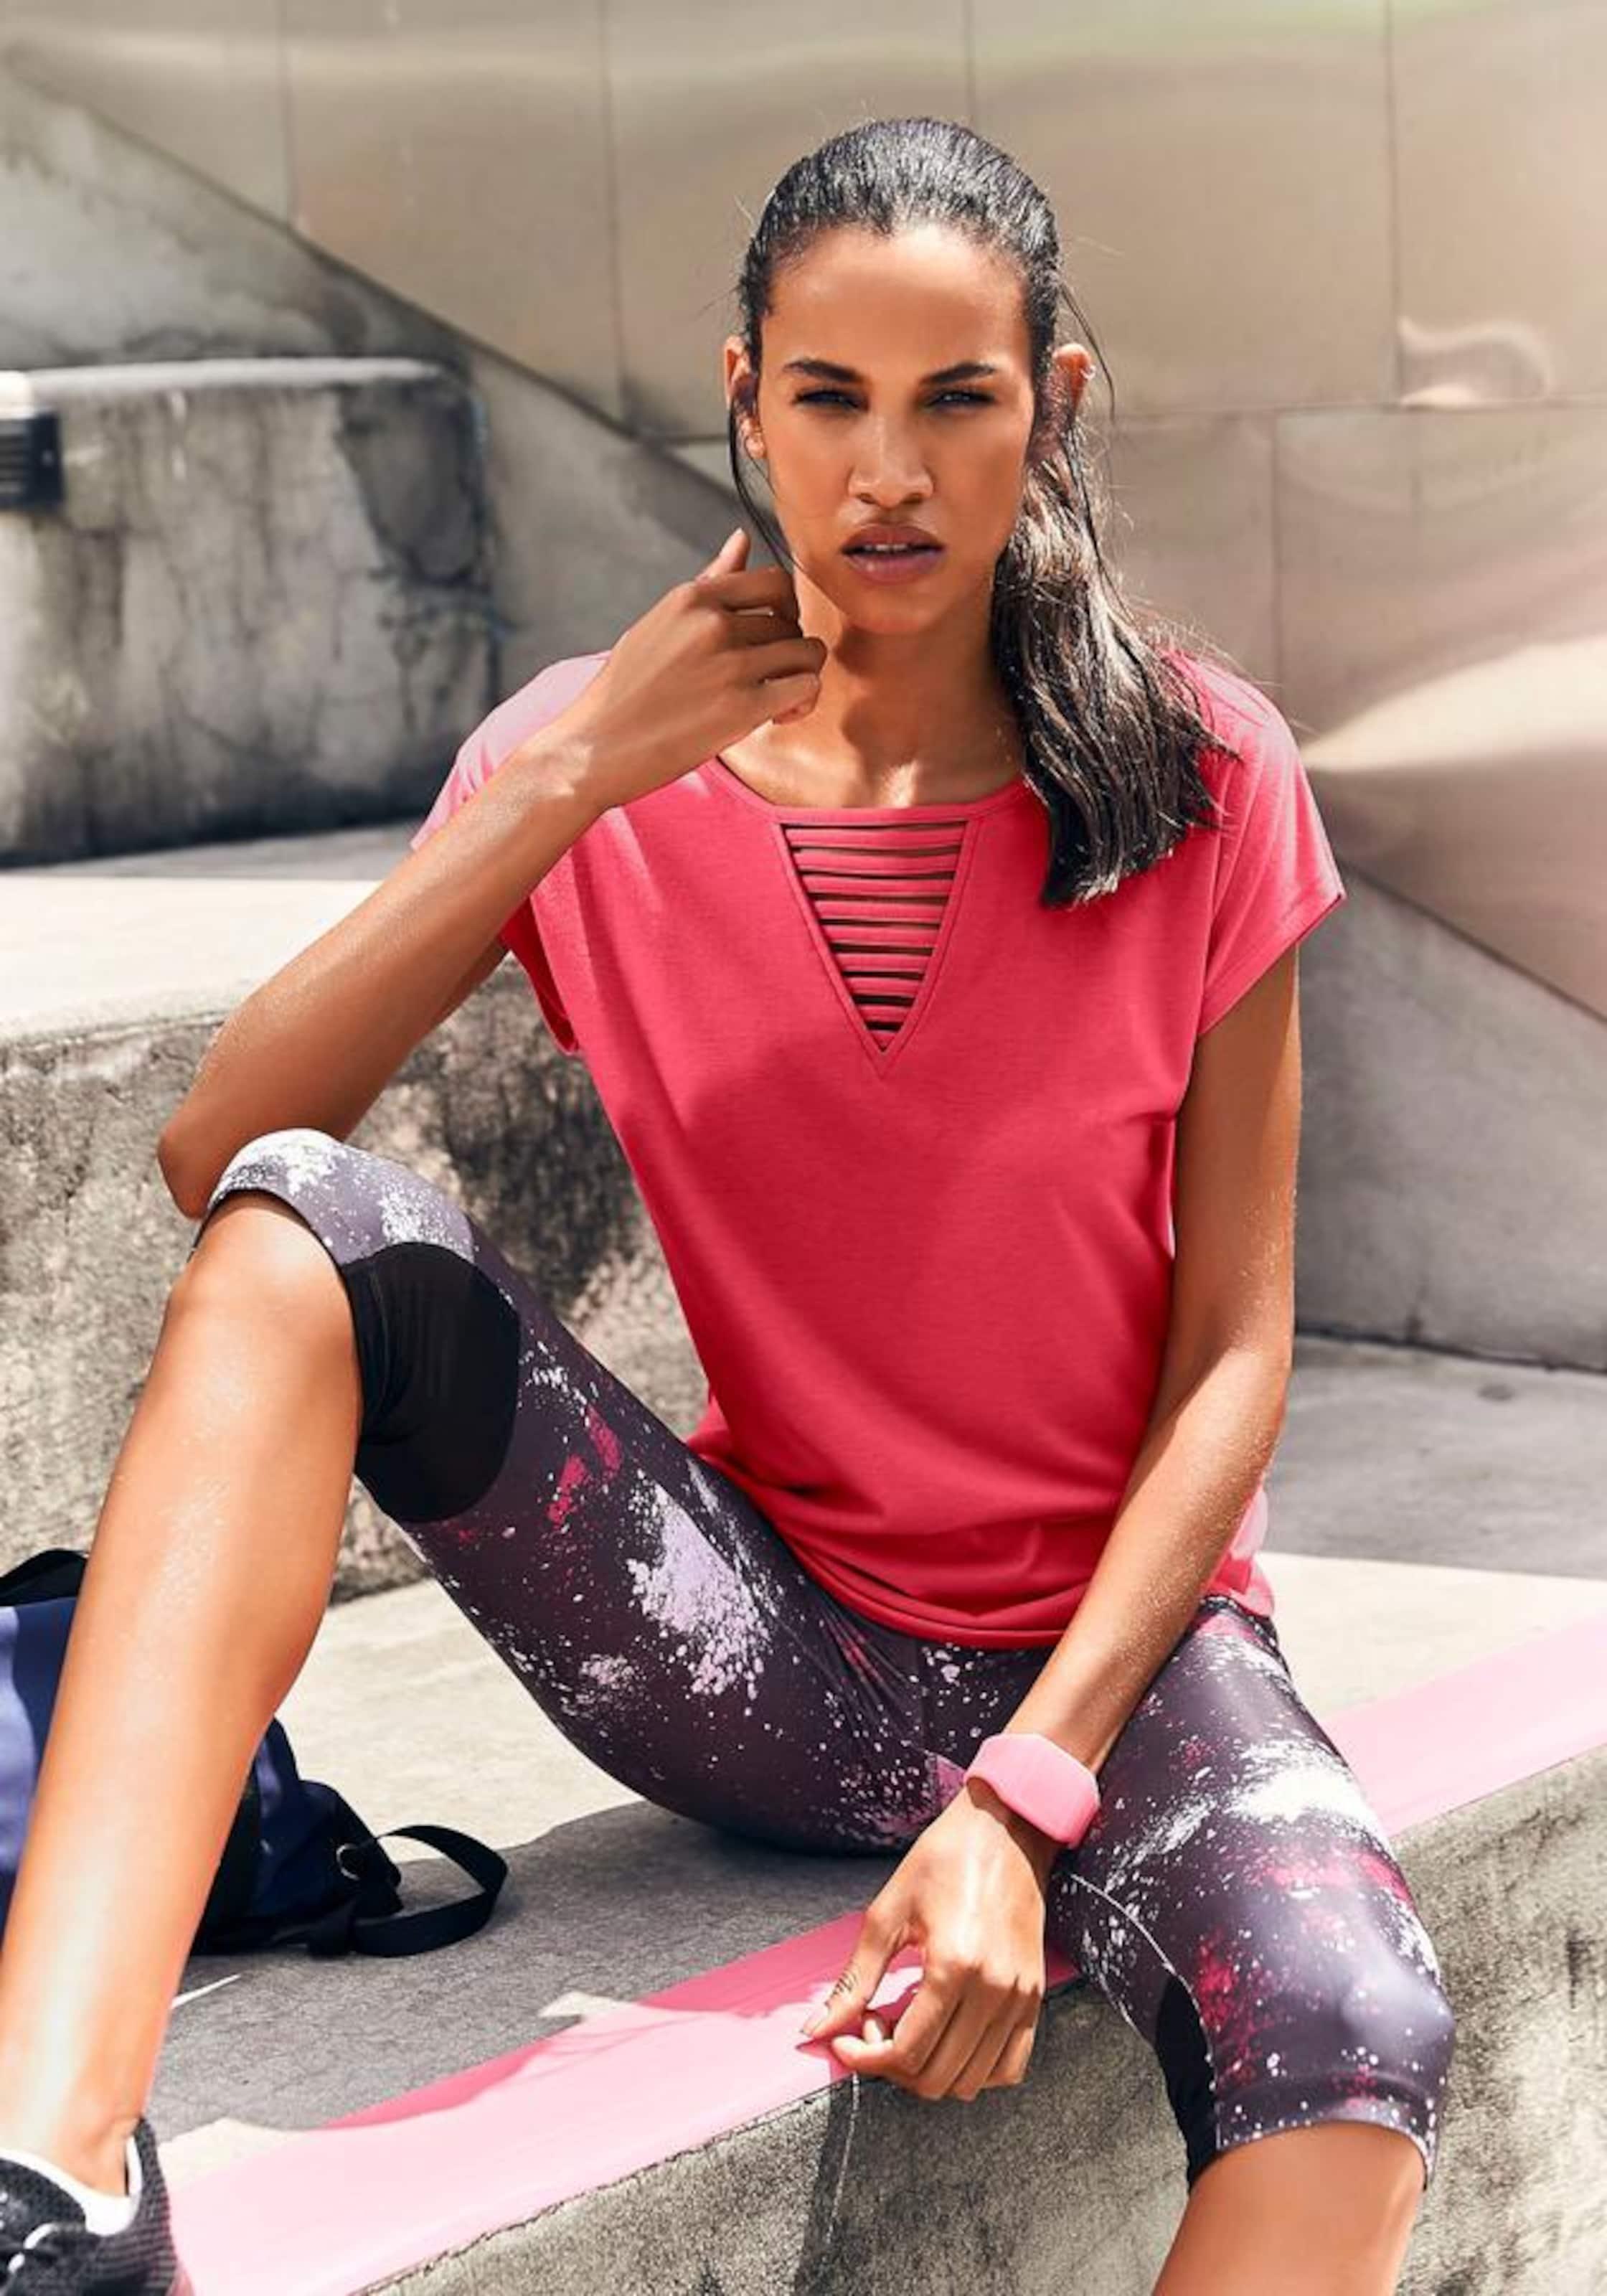 shirt 'galaxy' Lascana Active By In Pink T JTK13cuFl5